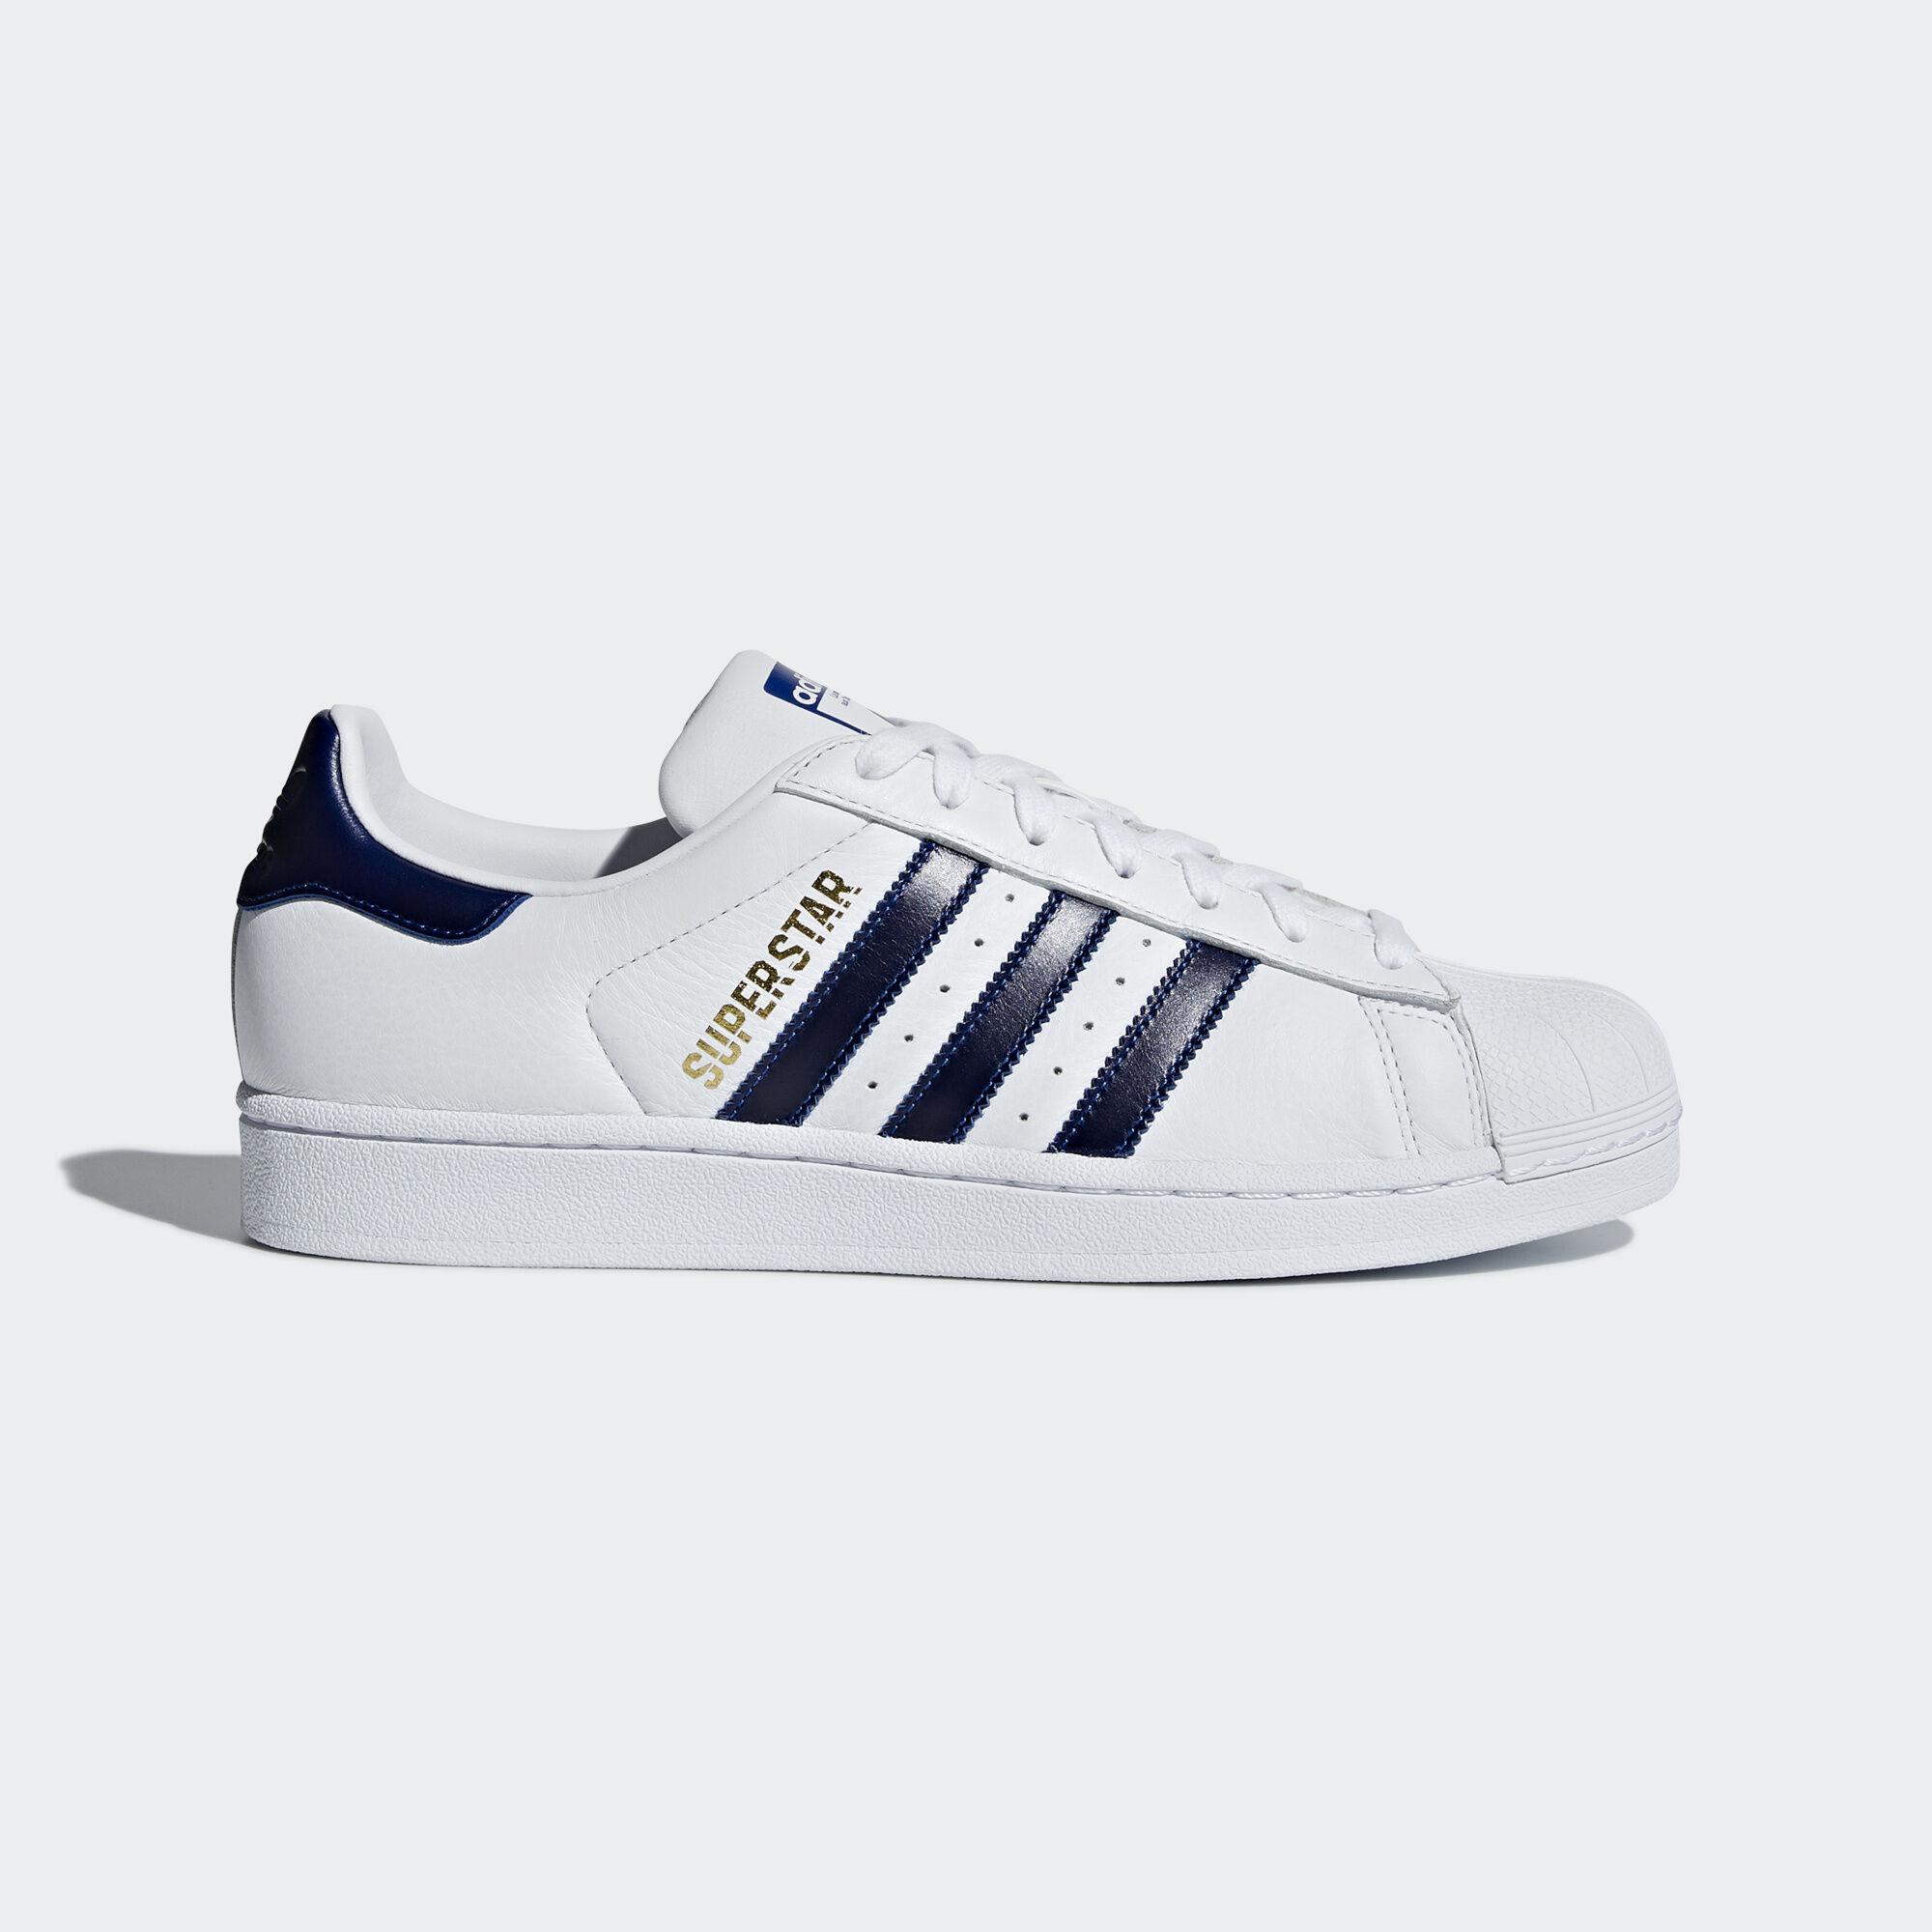 Adidas ne le scarpe adidas regionale bianco